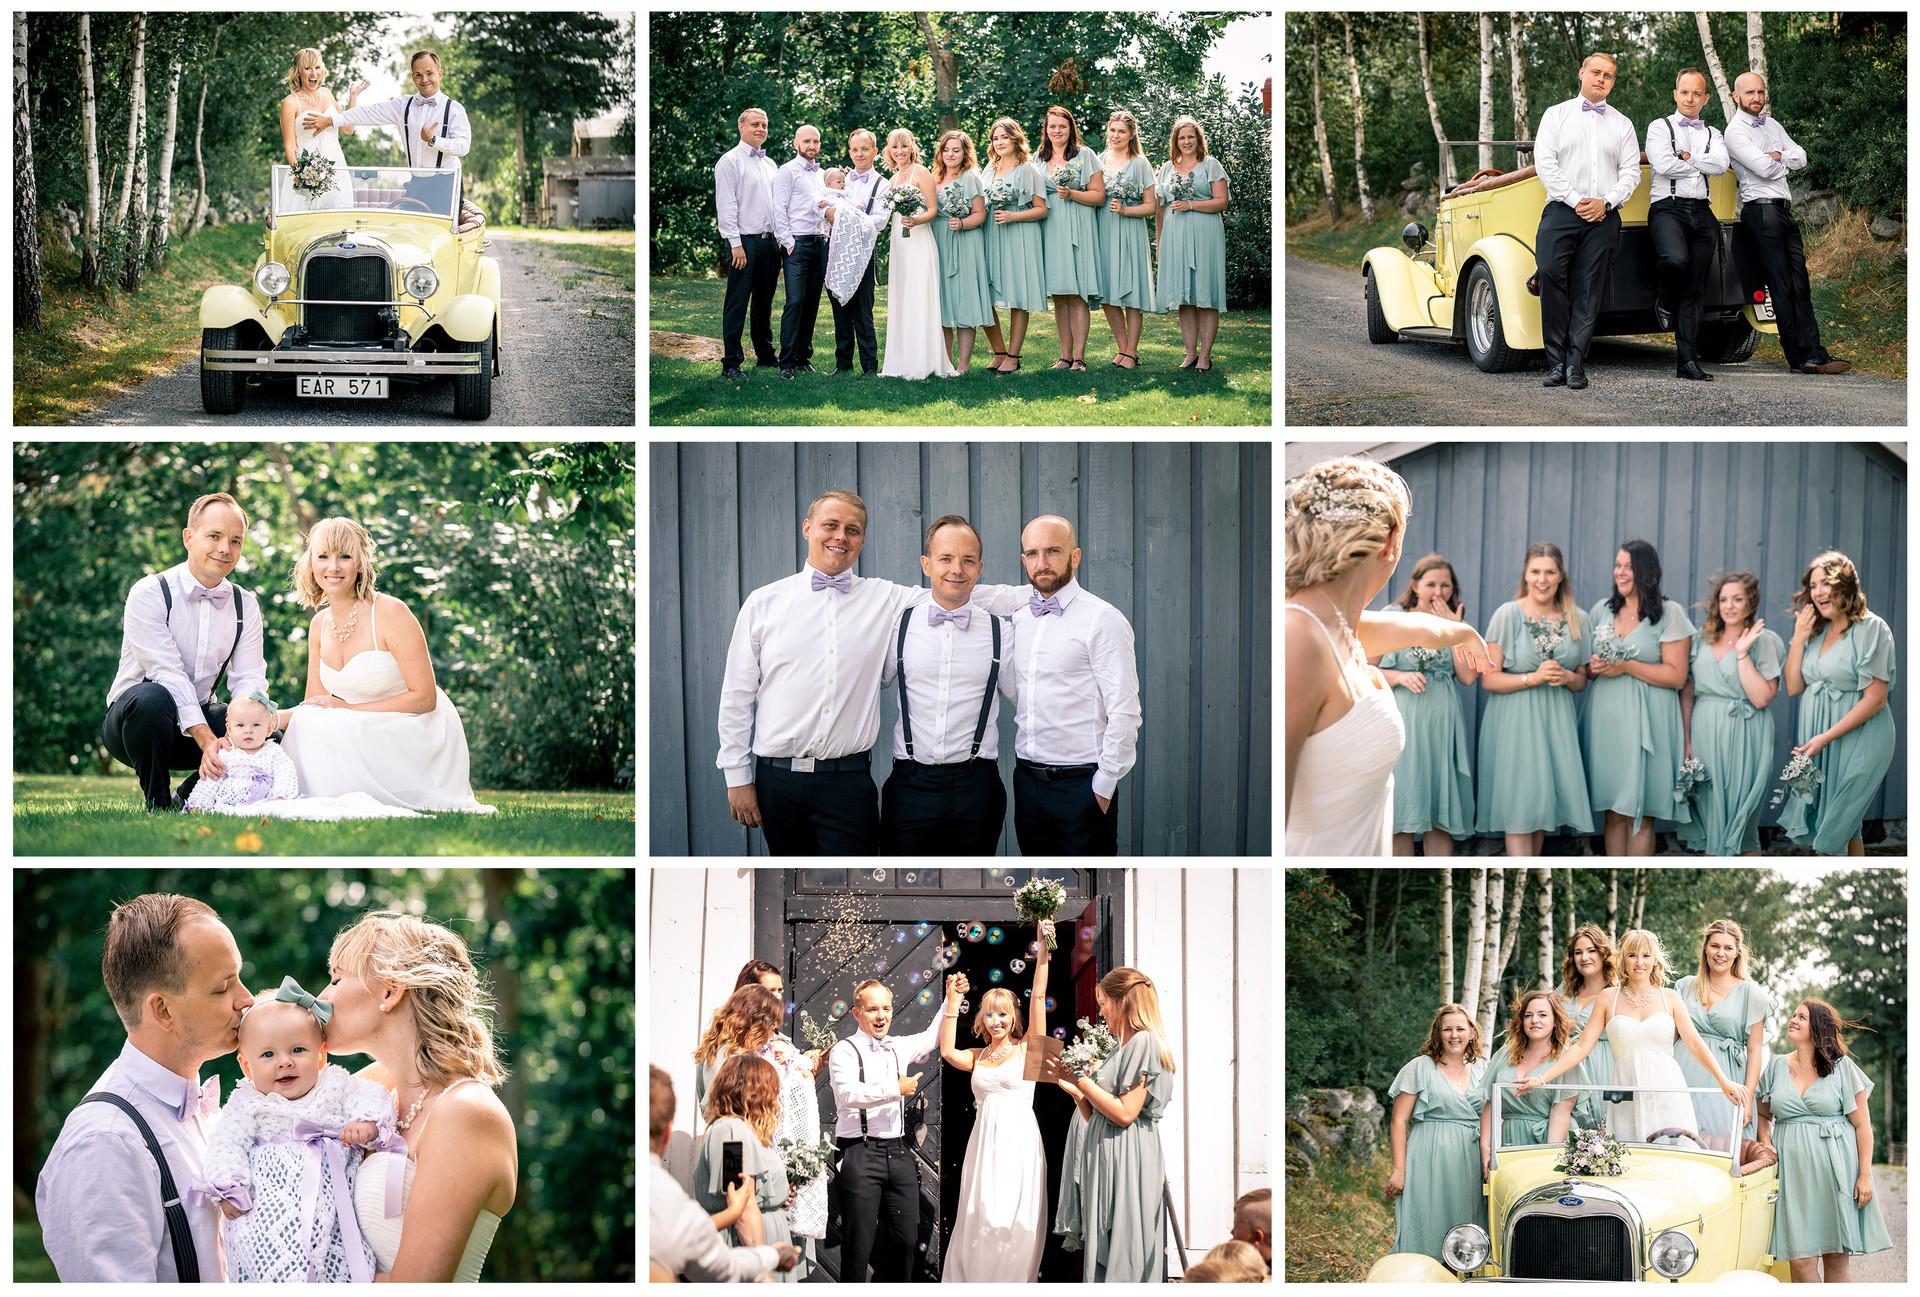 Wedding-Photography-Goteborg-06.jpg